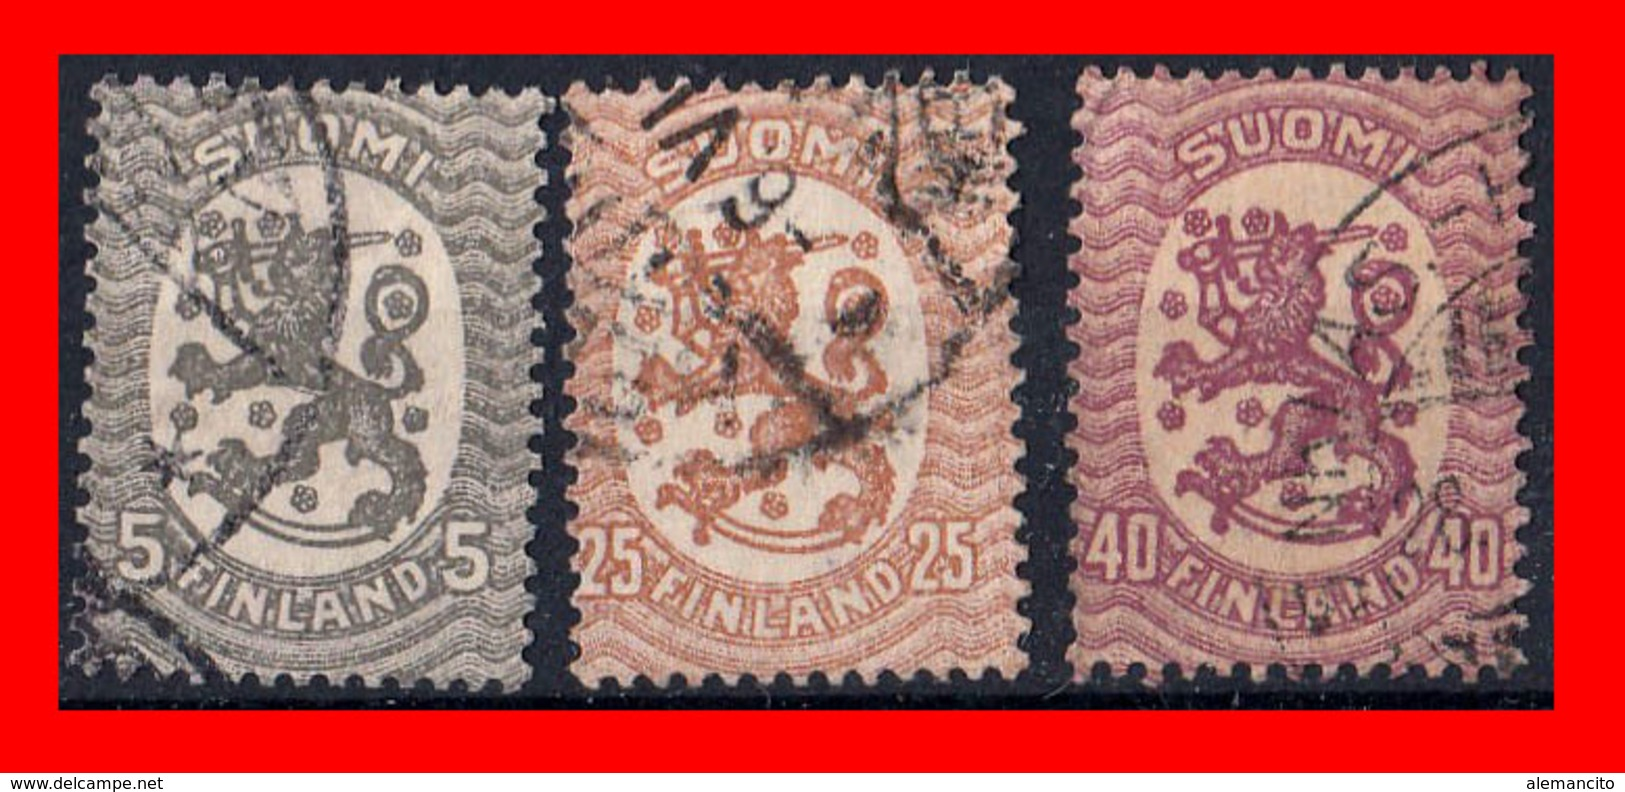 FINLANDIA (EUROPA) 3 SELLOS AÑO 1917-25 ESCUDO NACIONAL. EMISIÓN DE HELSINKI. - Finland